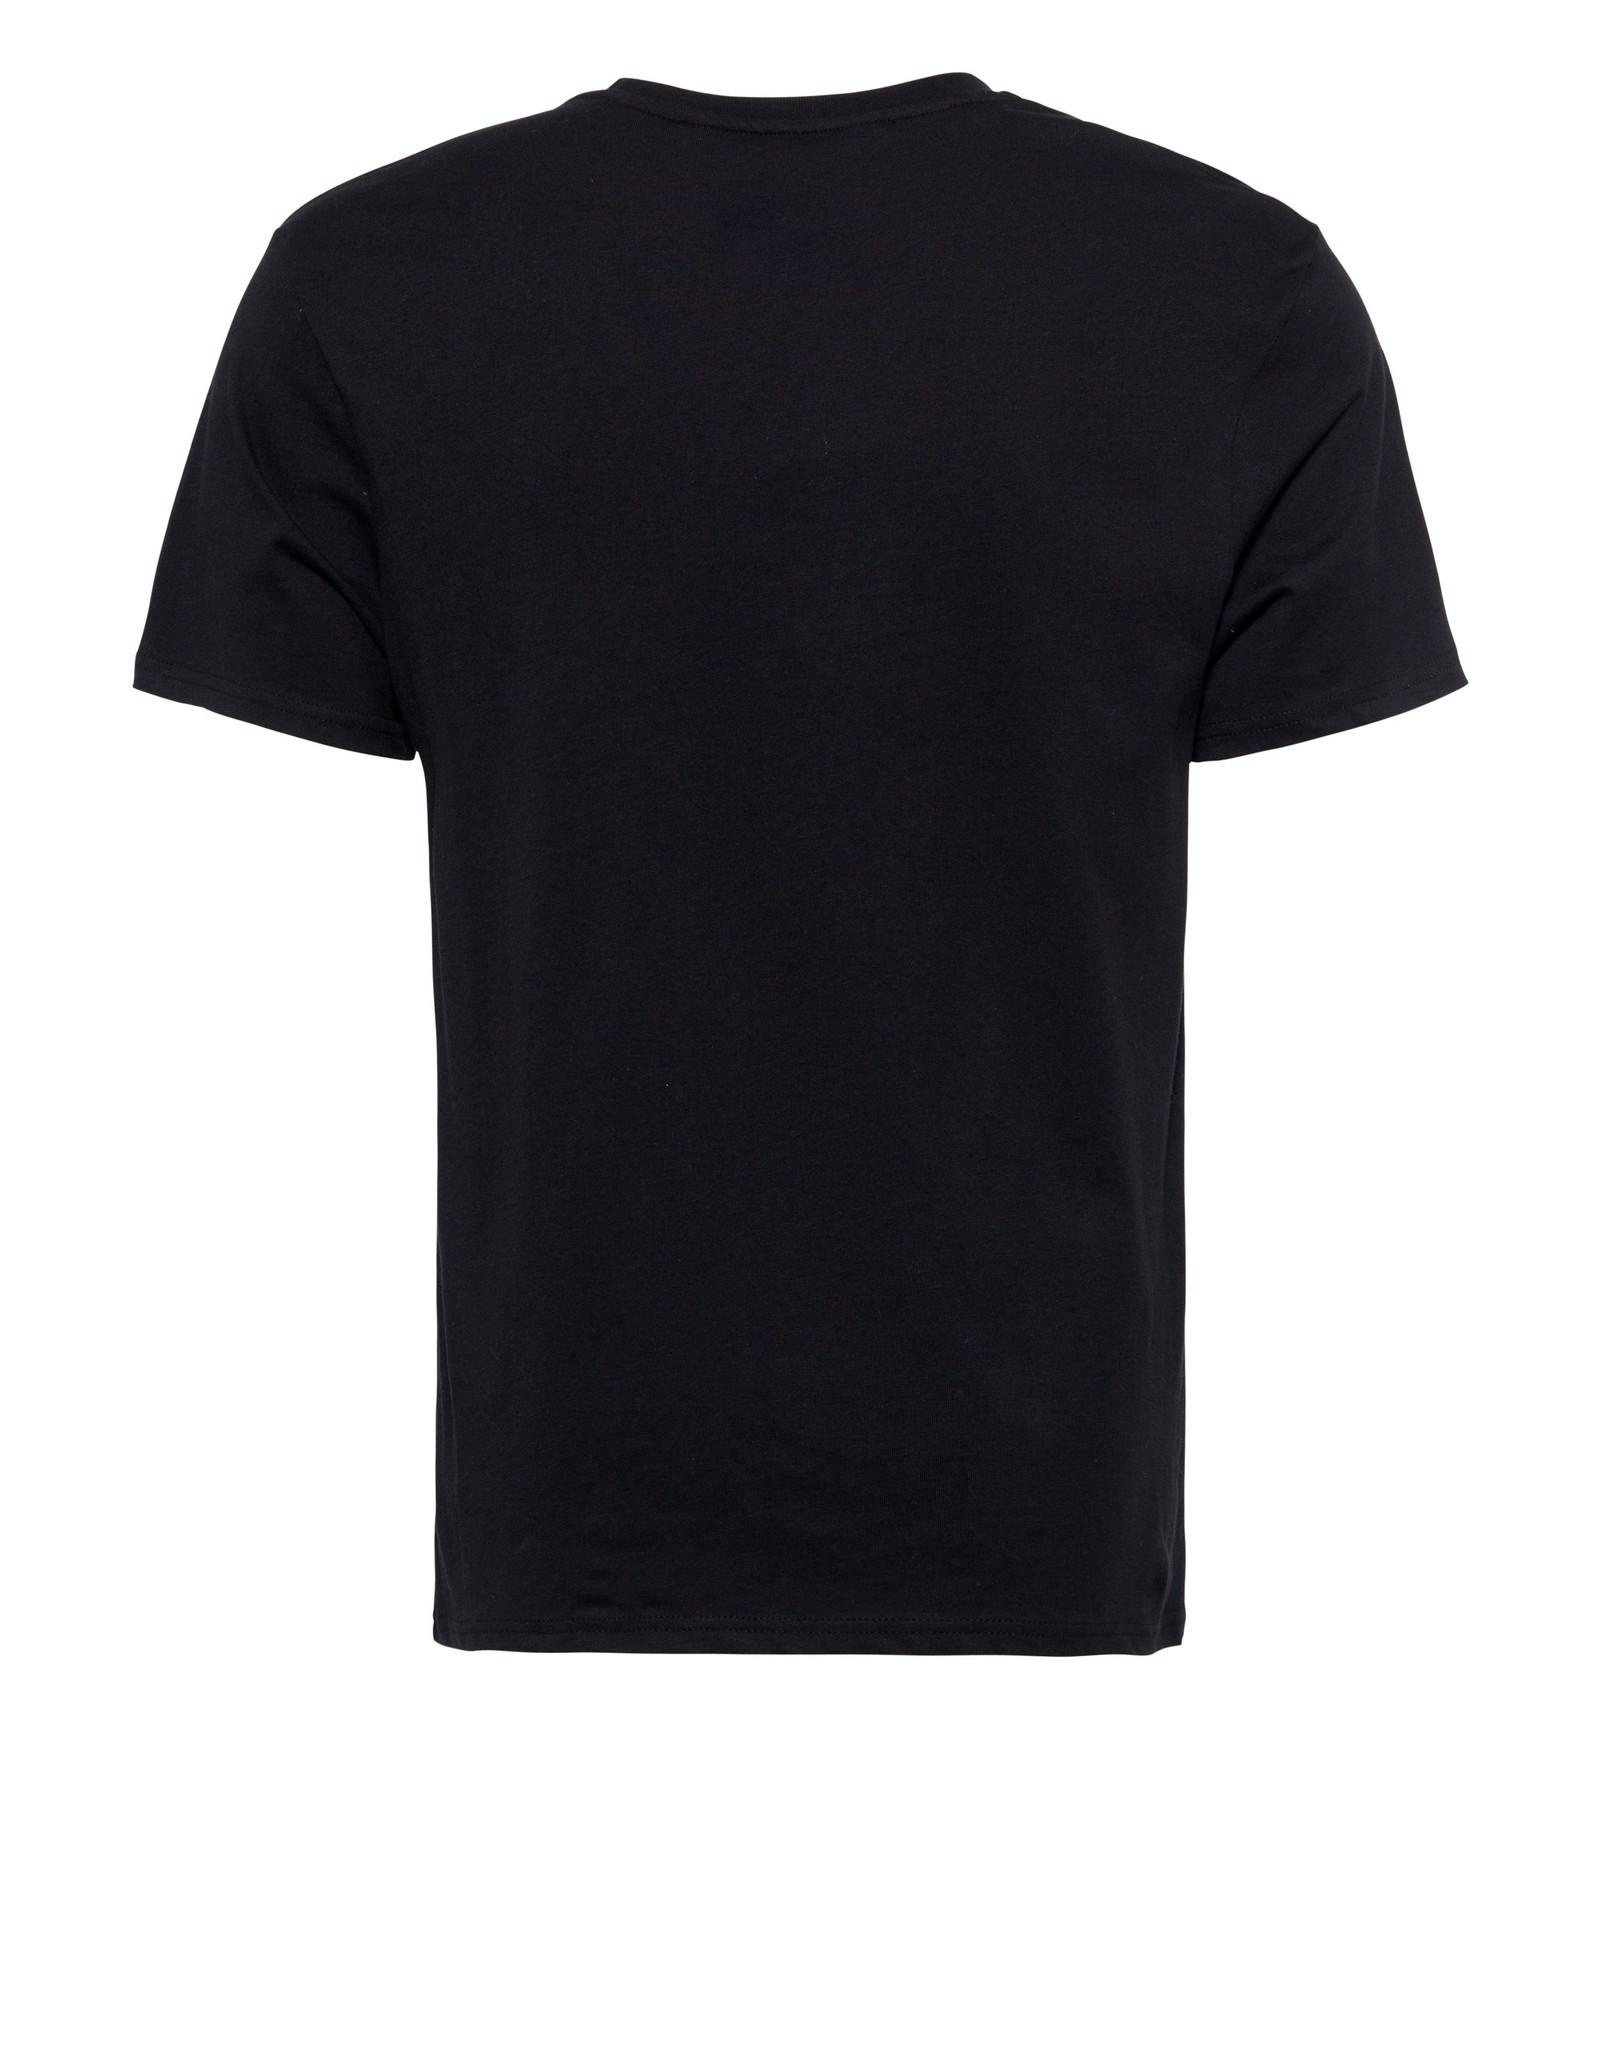 King Kerosin King Kerosin T-Shirt Garage Built in Black